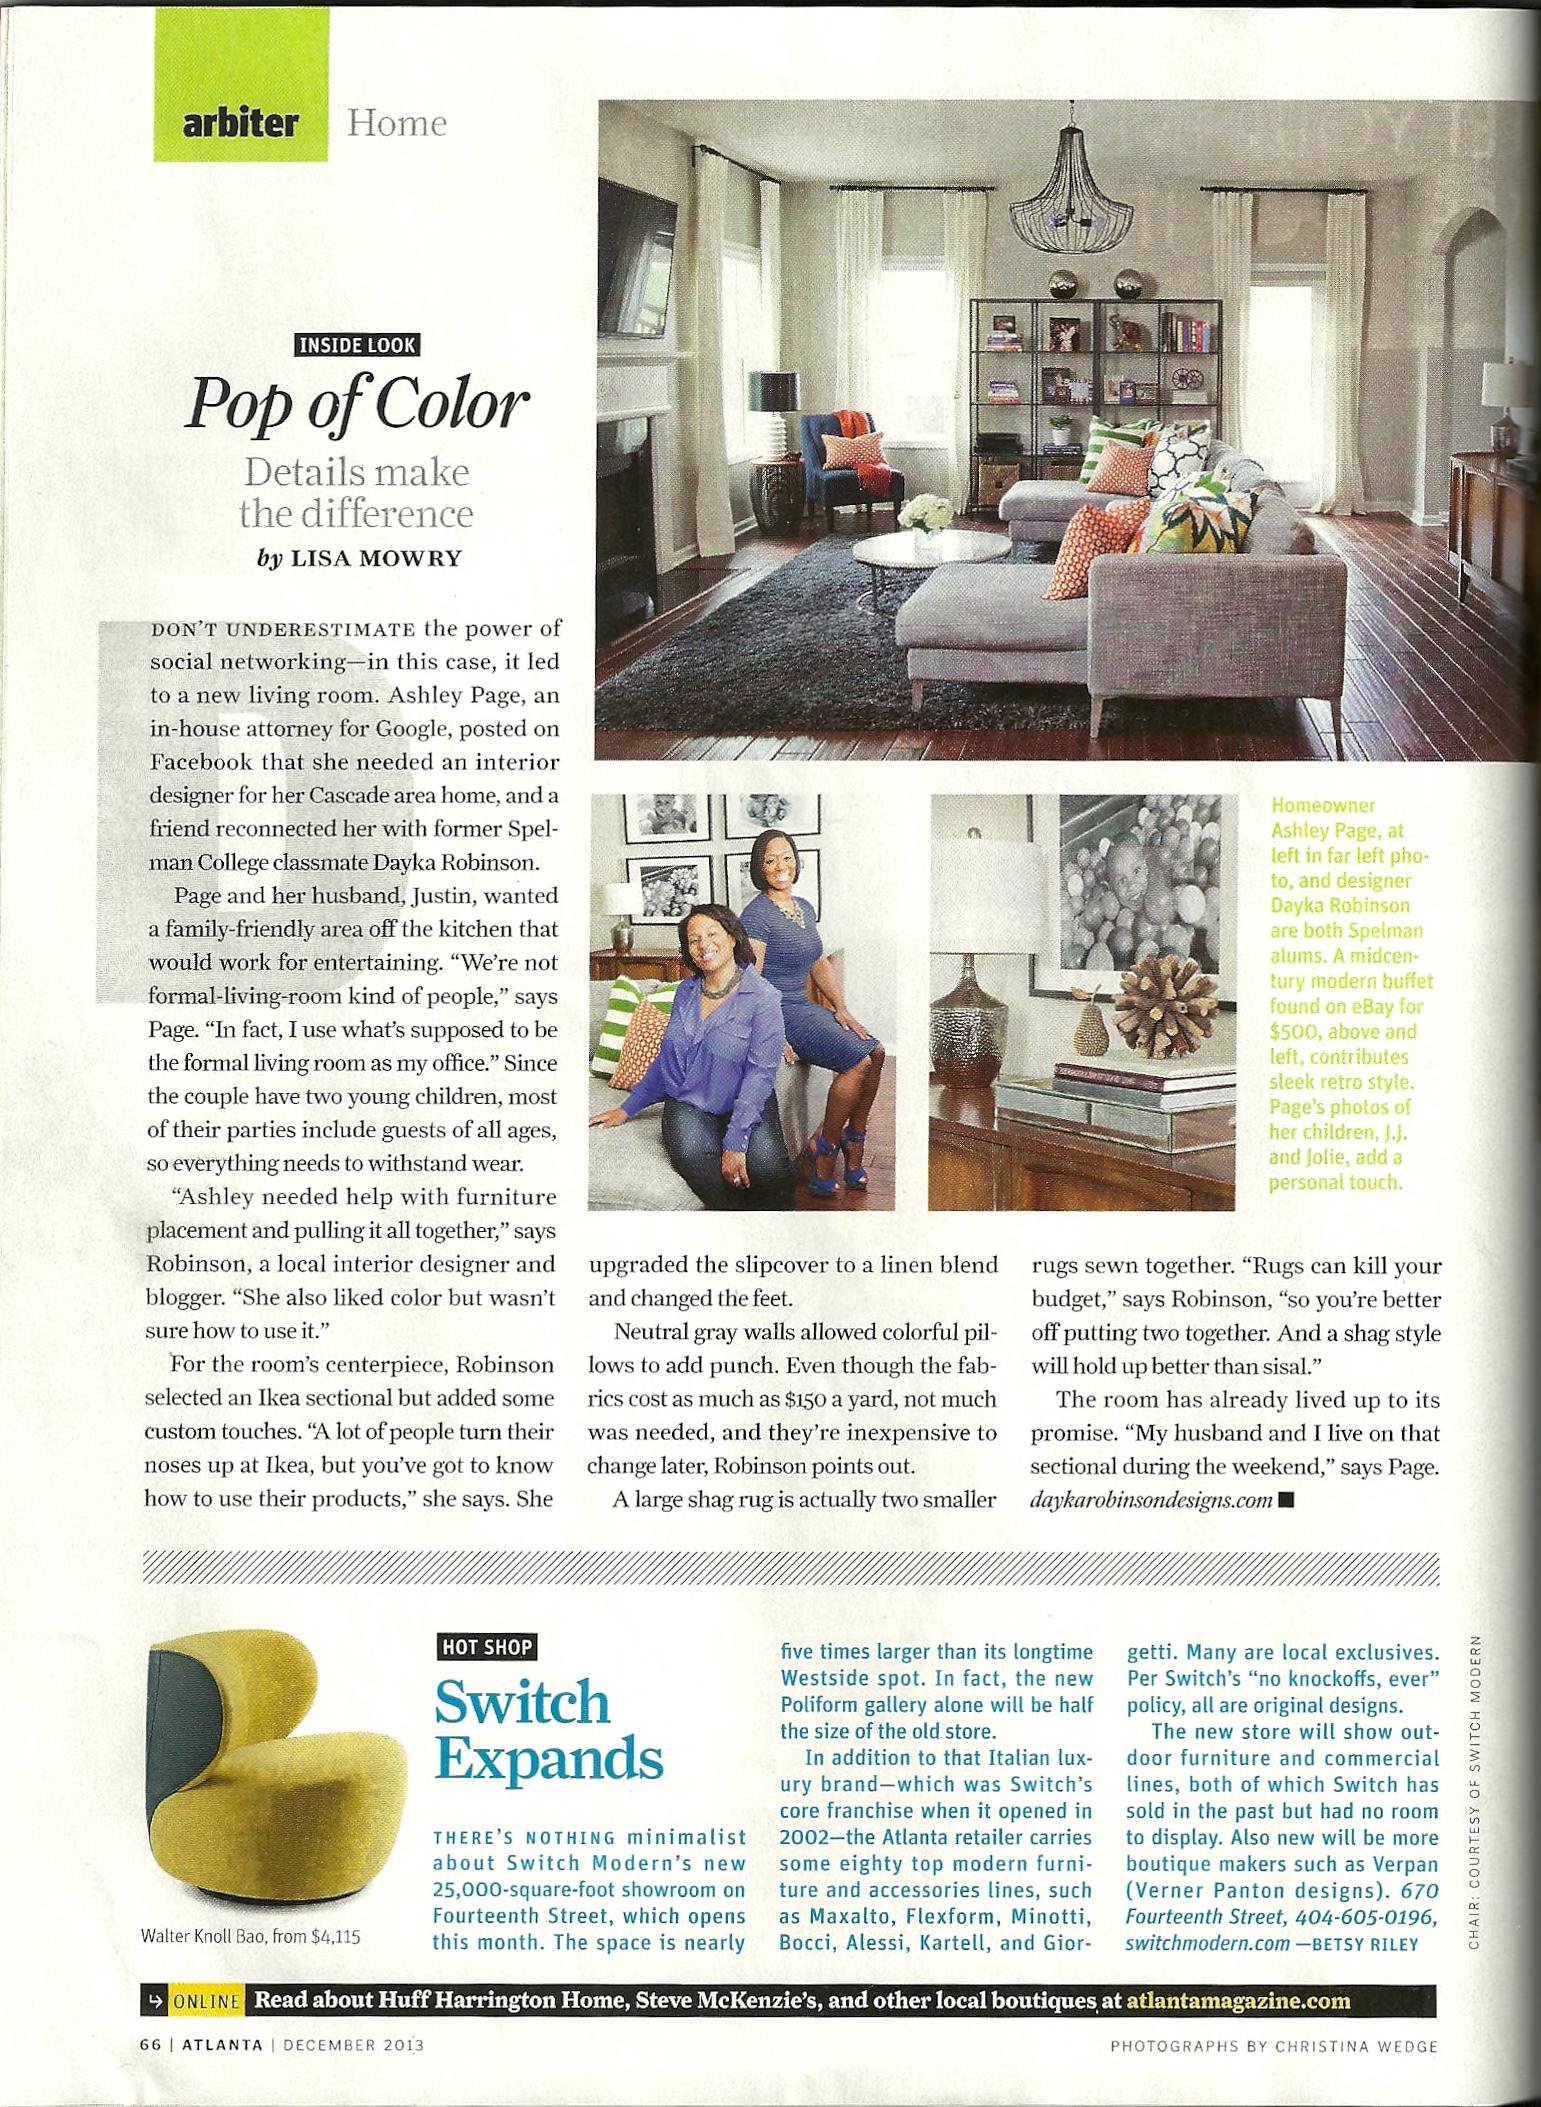 Dayka Robinson Atlanta Magazine press, Dec 2013.jpg